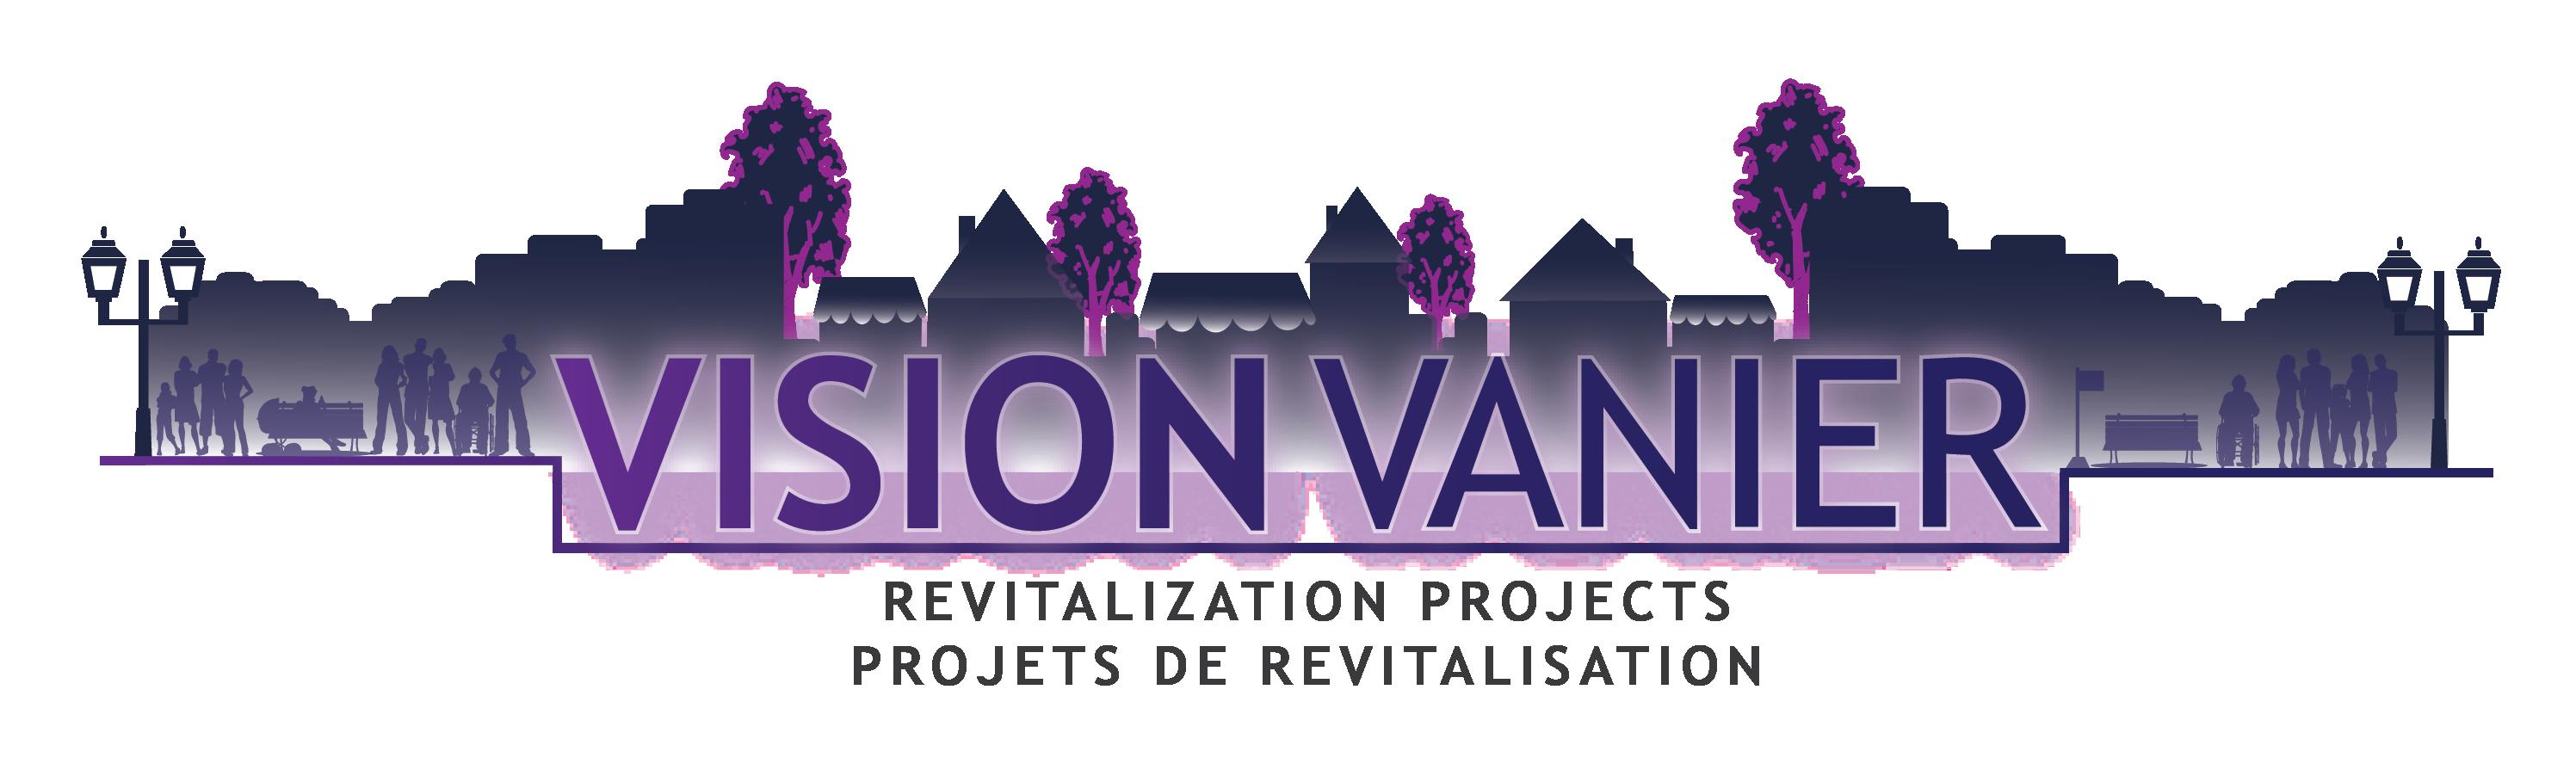 Vision vanier logo